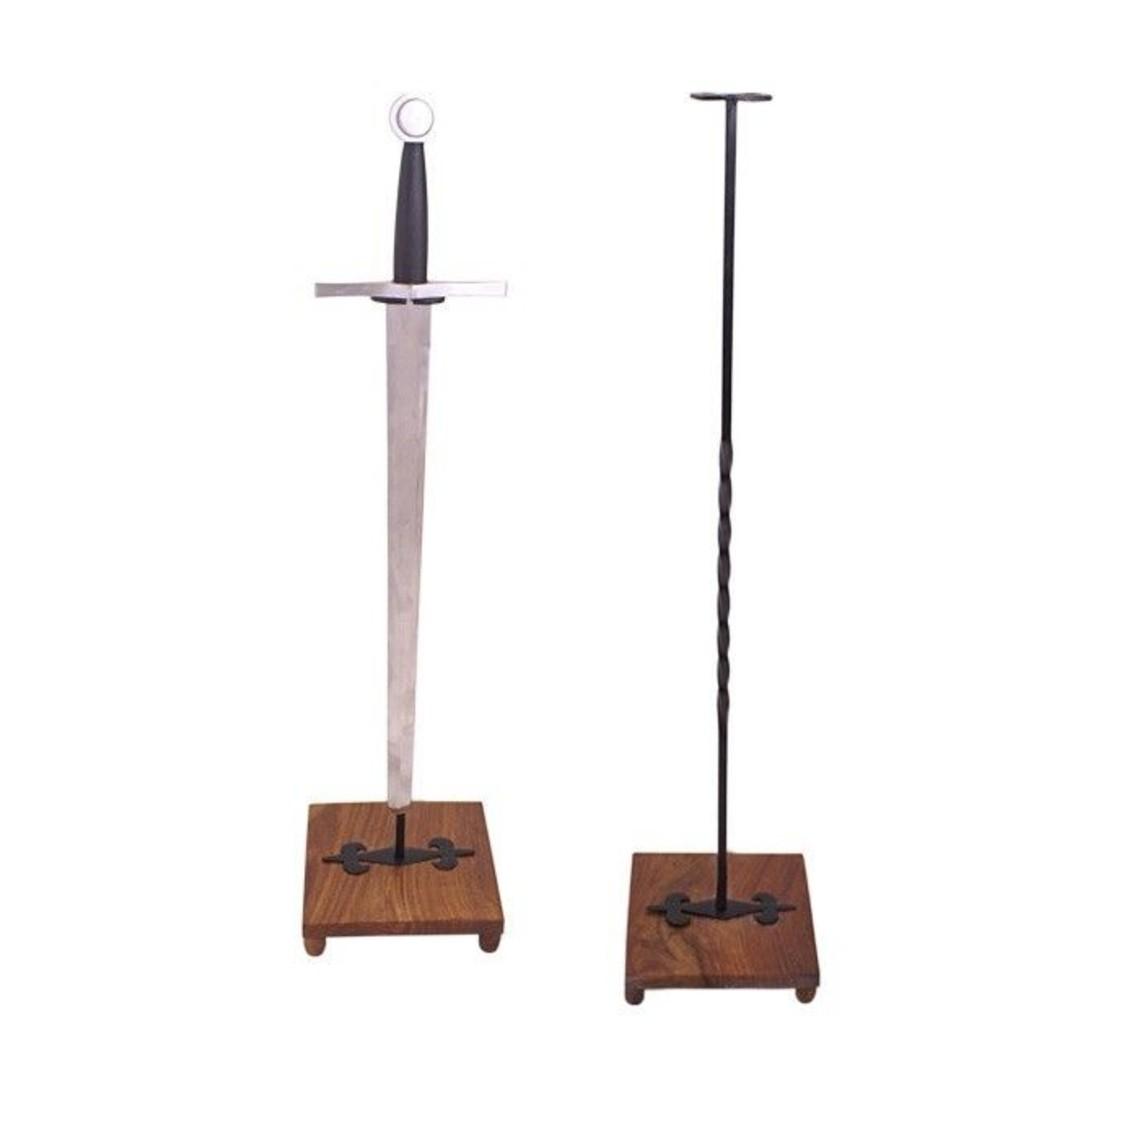 Stort svärd stand